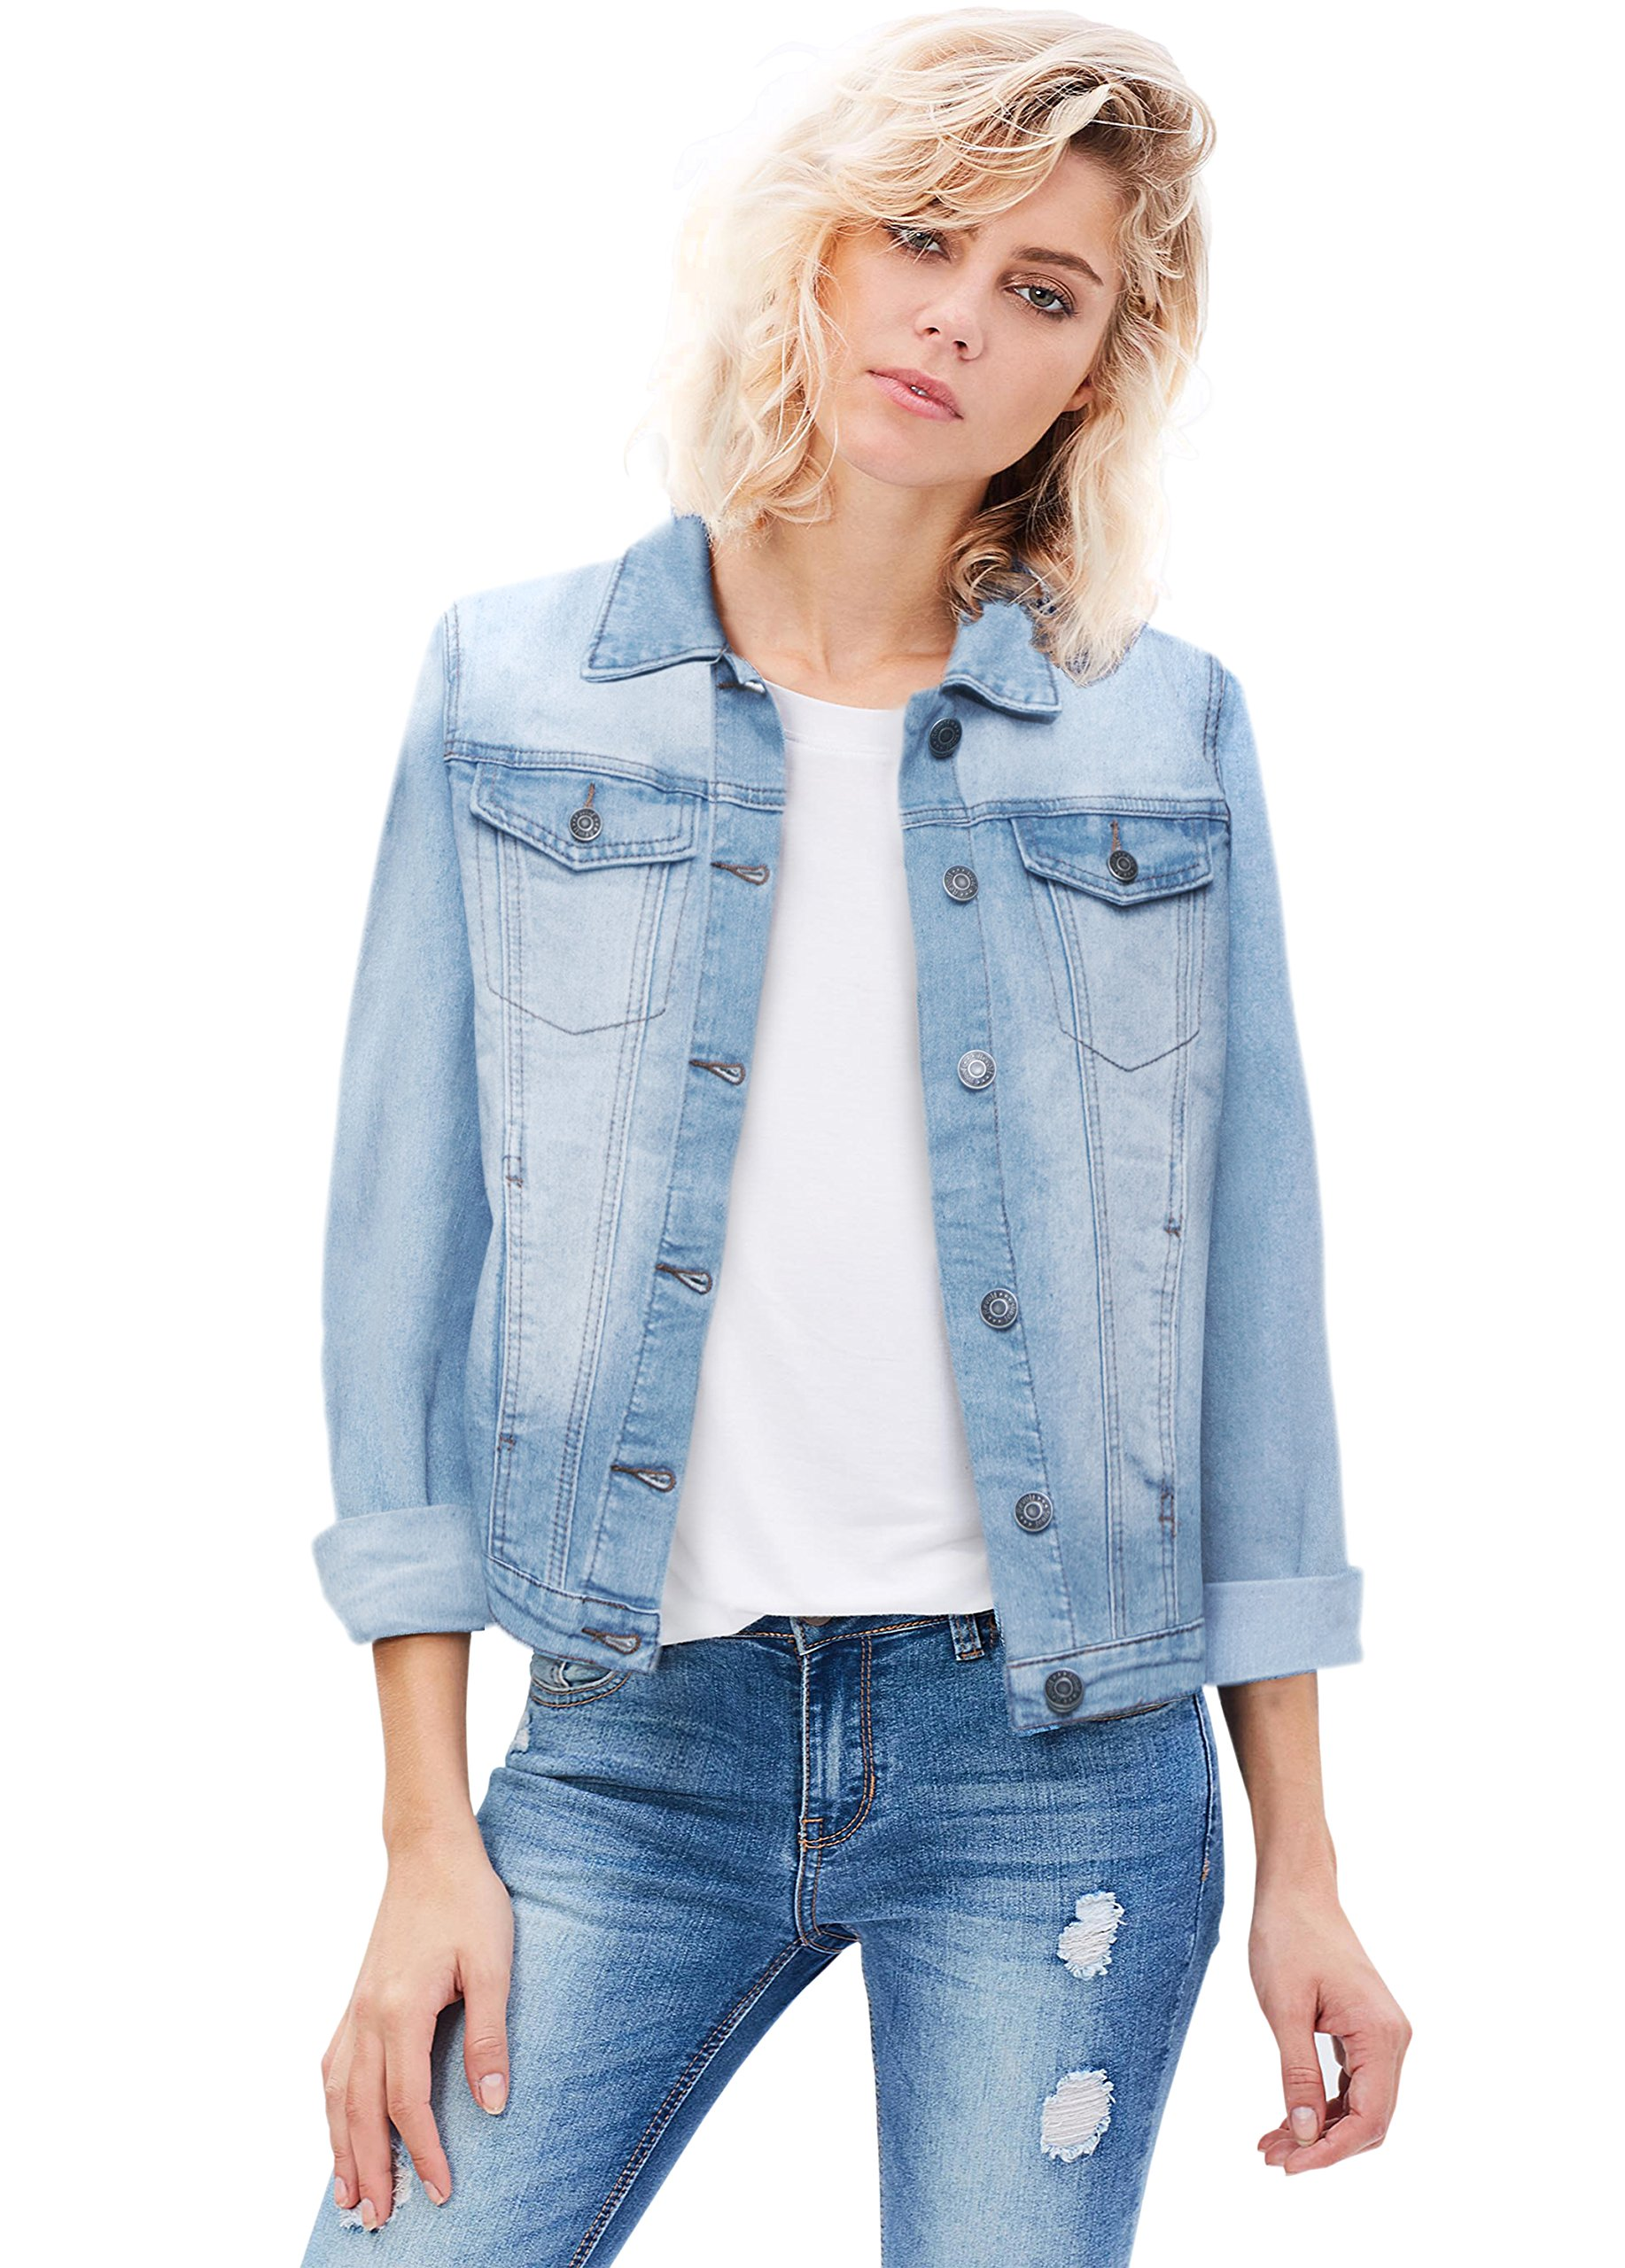 Revolt Women Junior Classic 4 Pockets Denim Jacket JK175590 Light WASH S